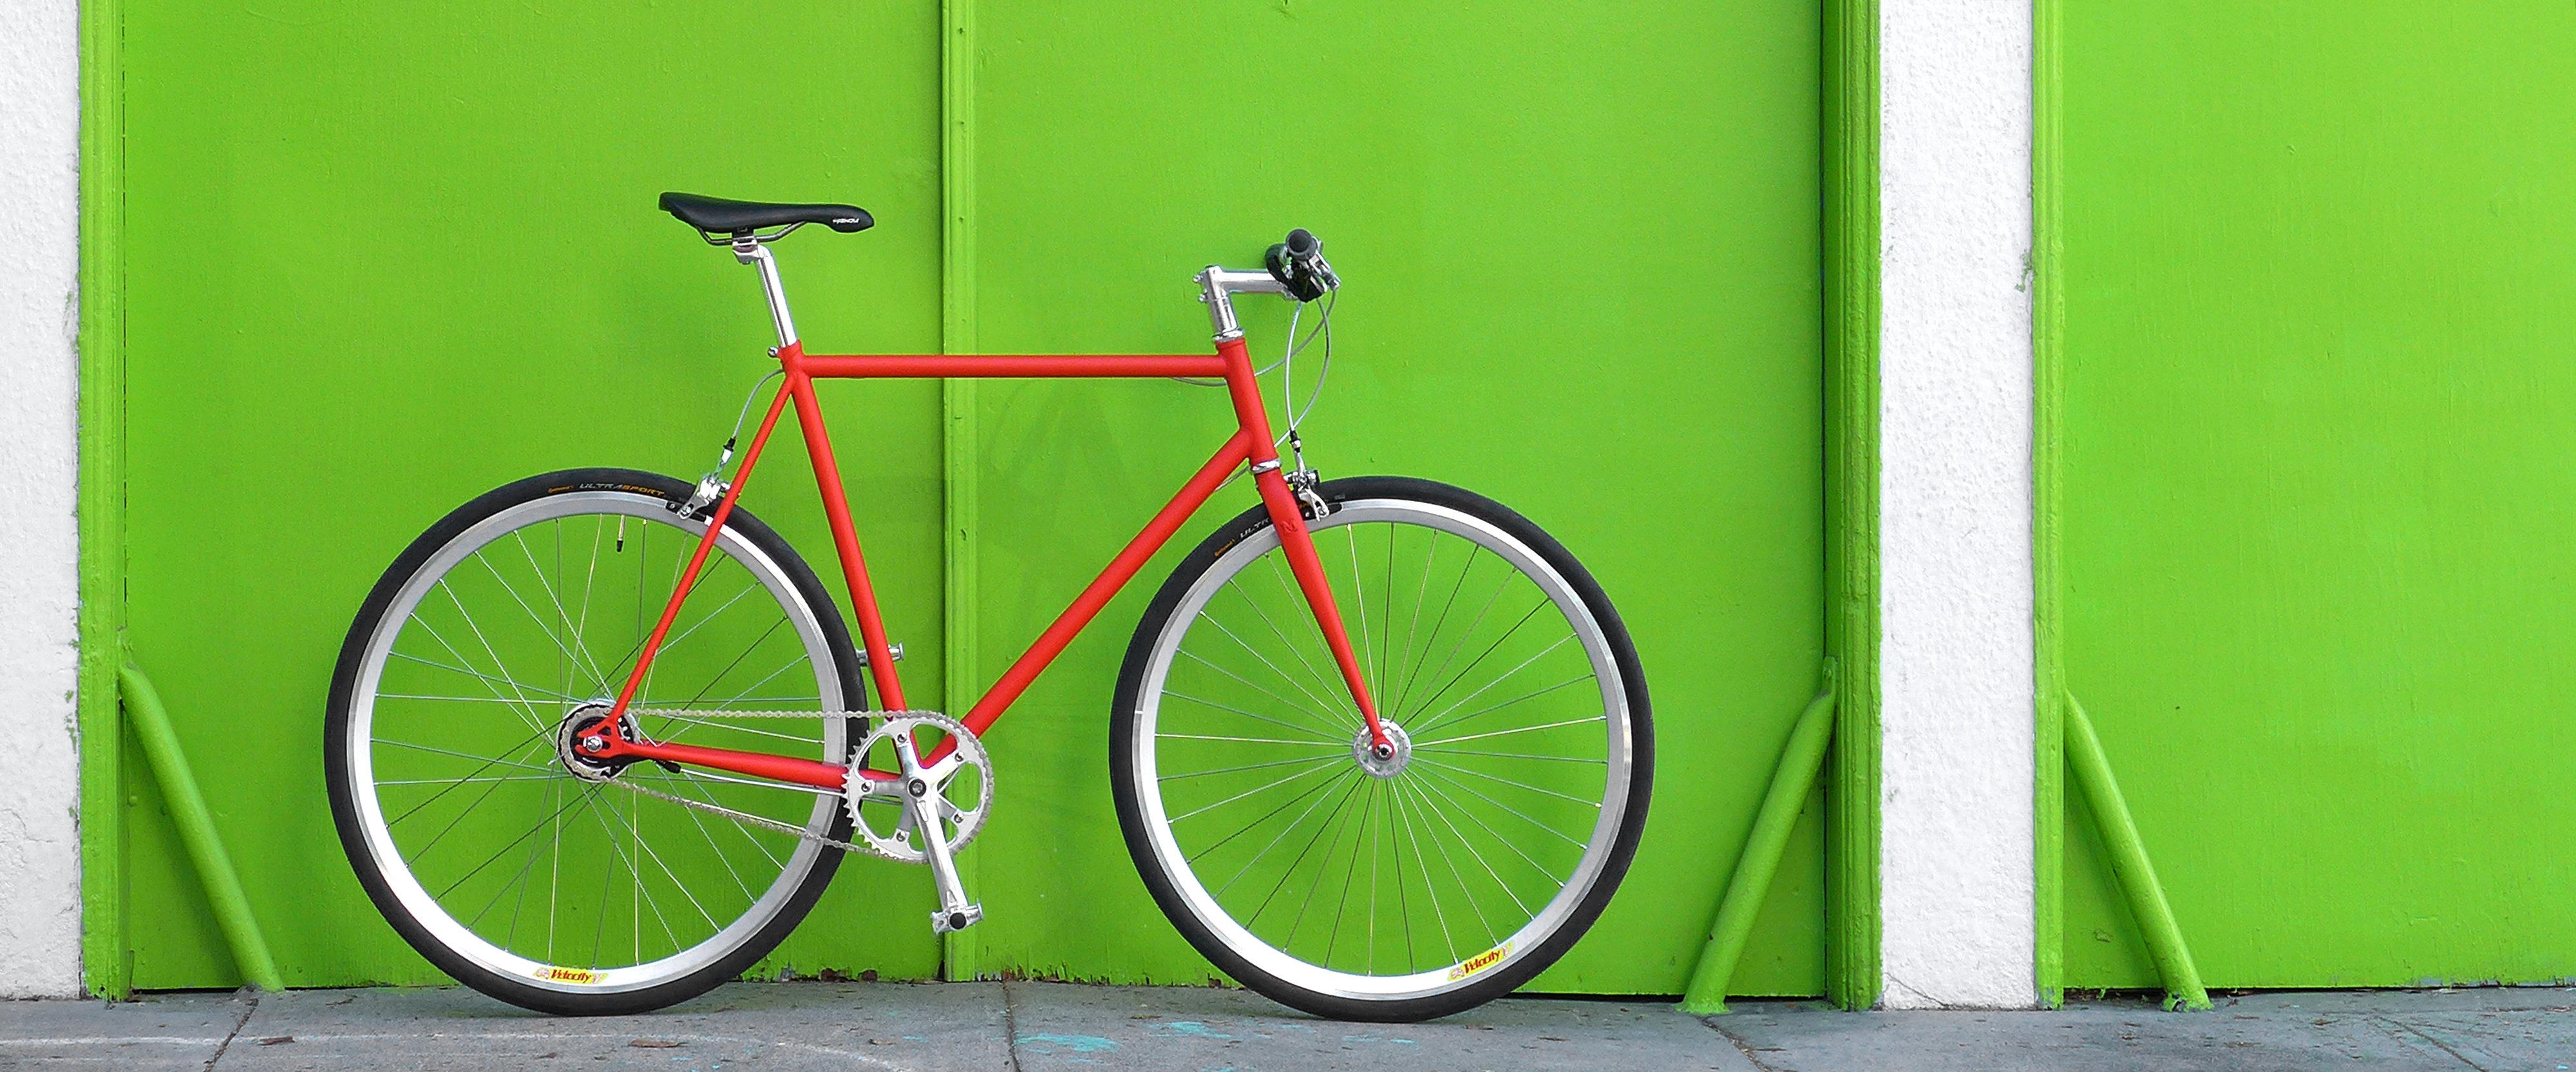 Mission Bicycle custom bike